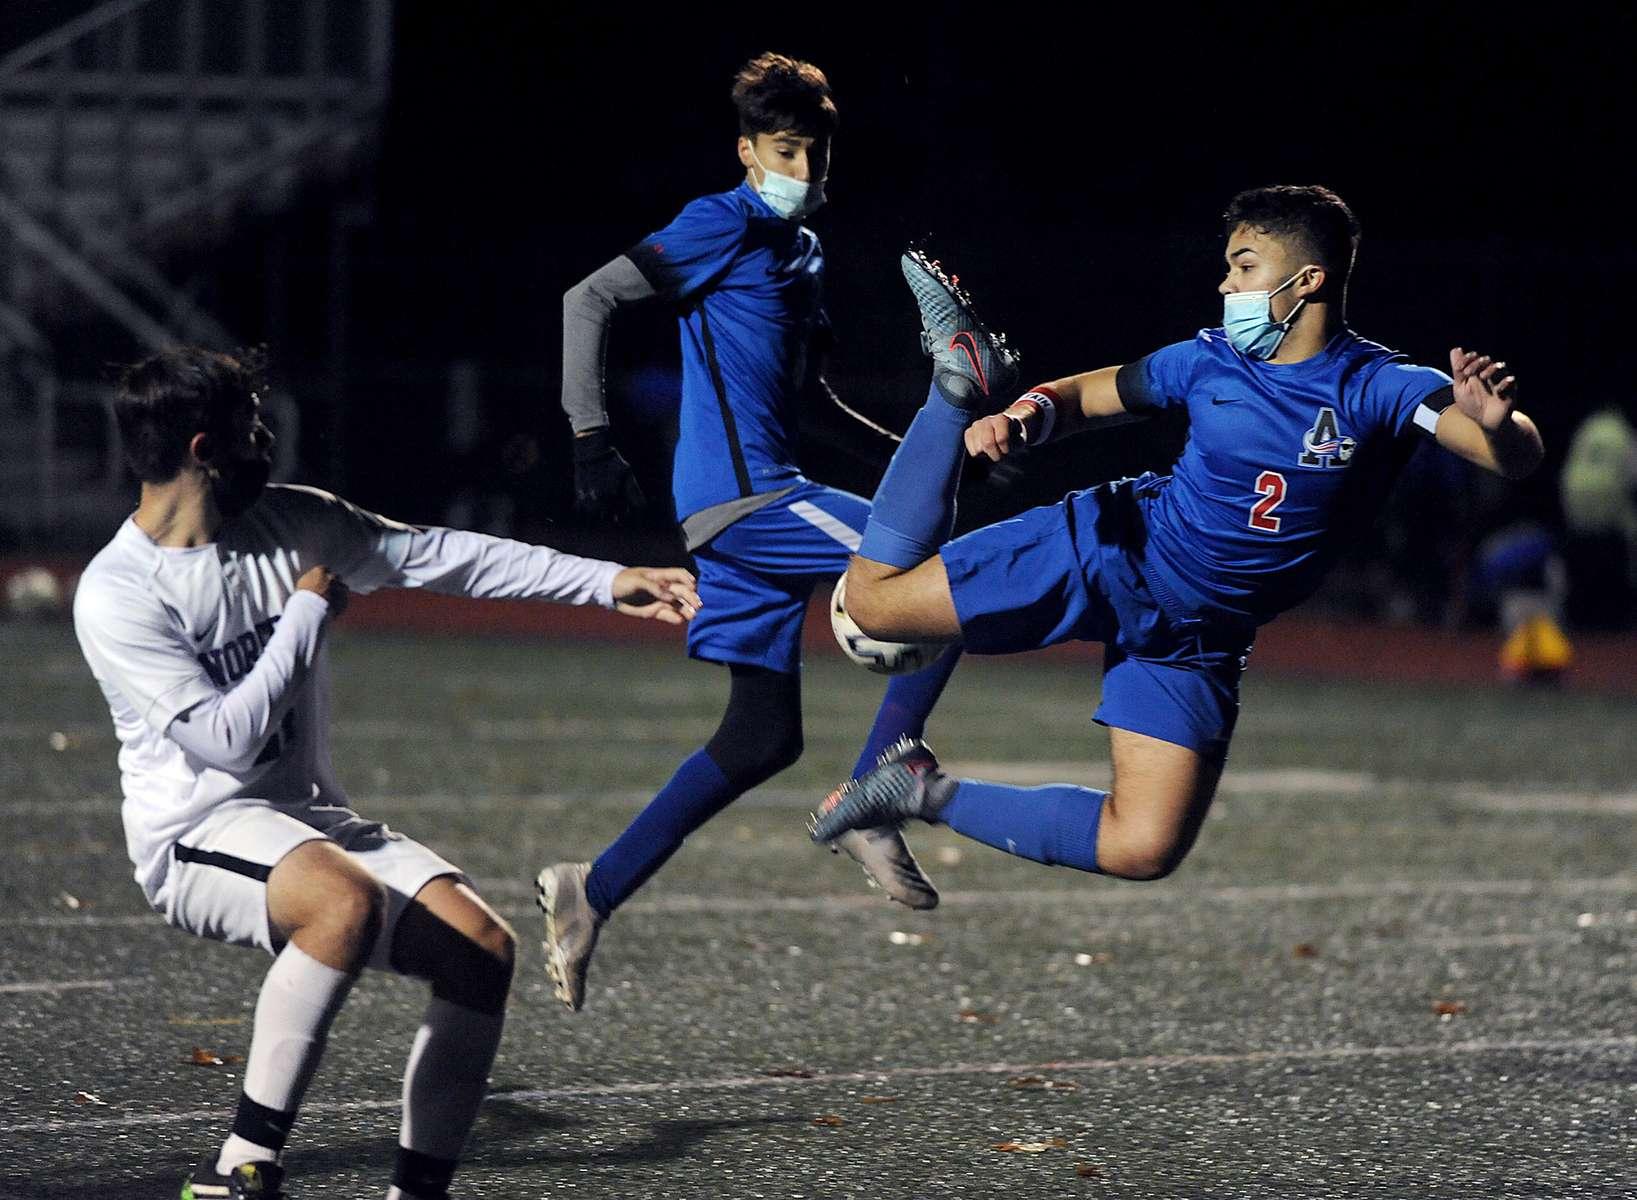 Ashland High School soccer player Shea Donovan goes airborne against Norton Nov. 13, 2020.